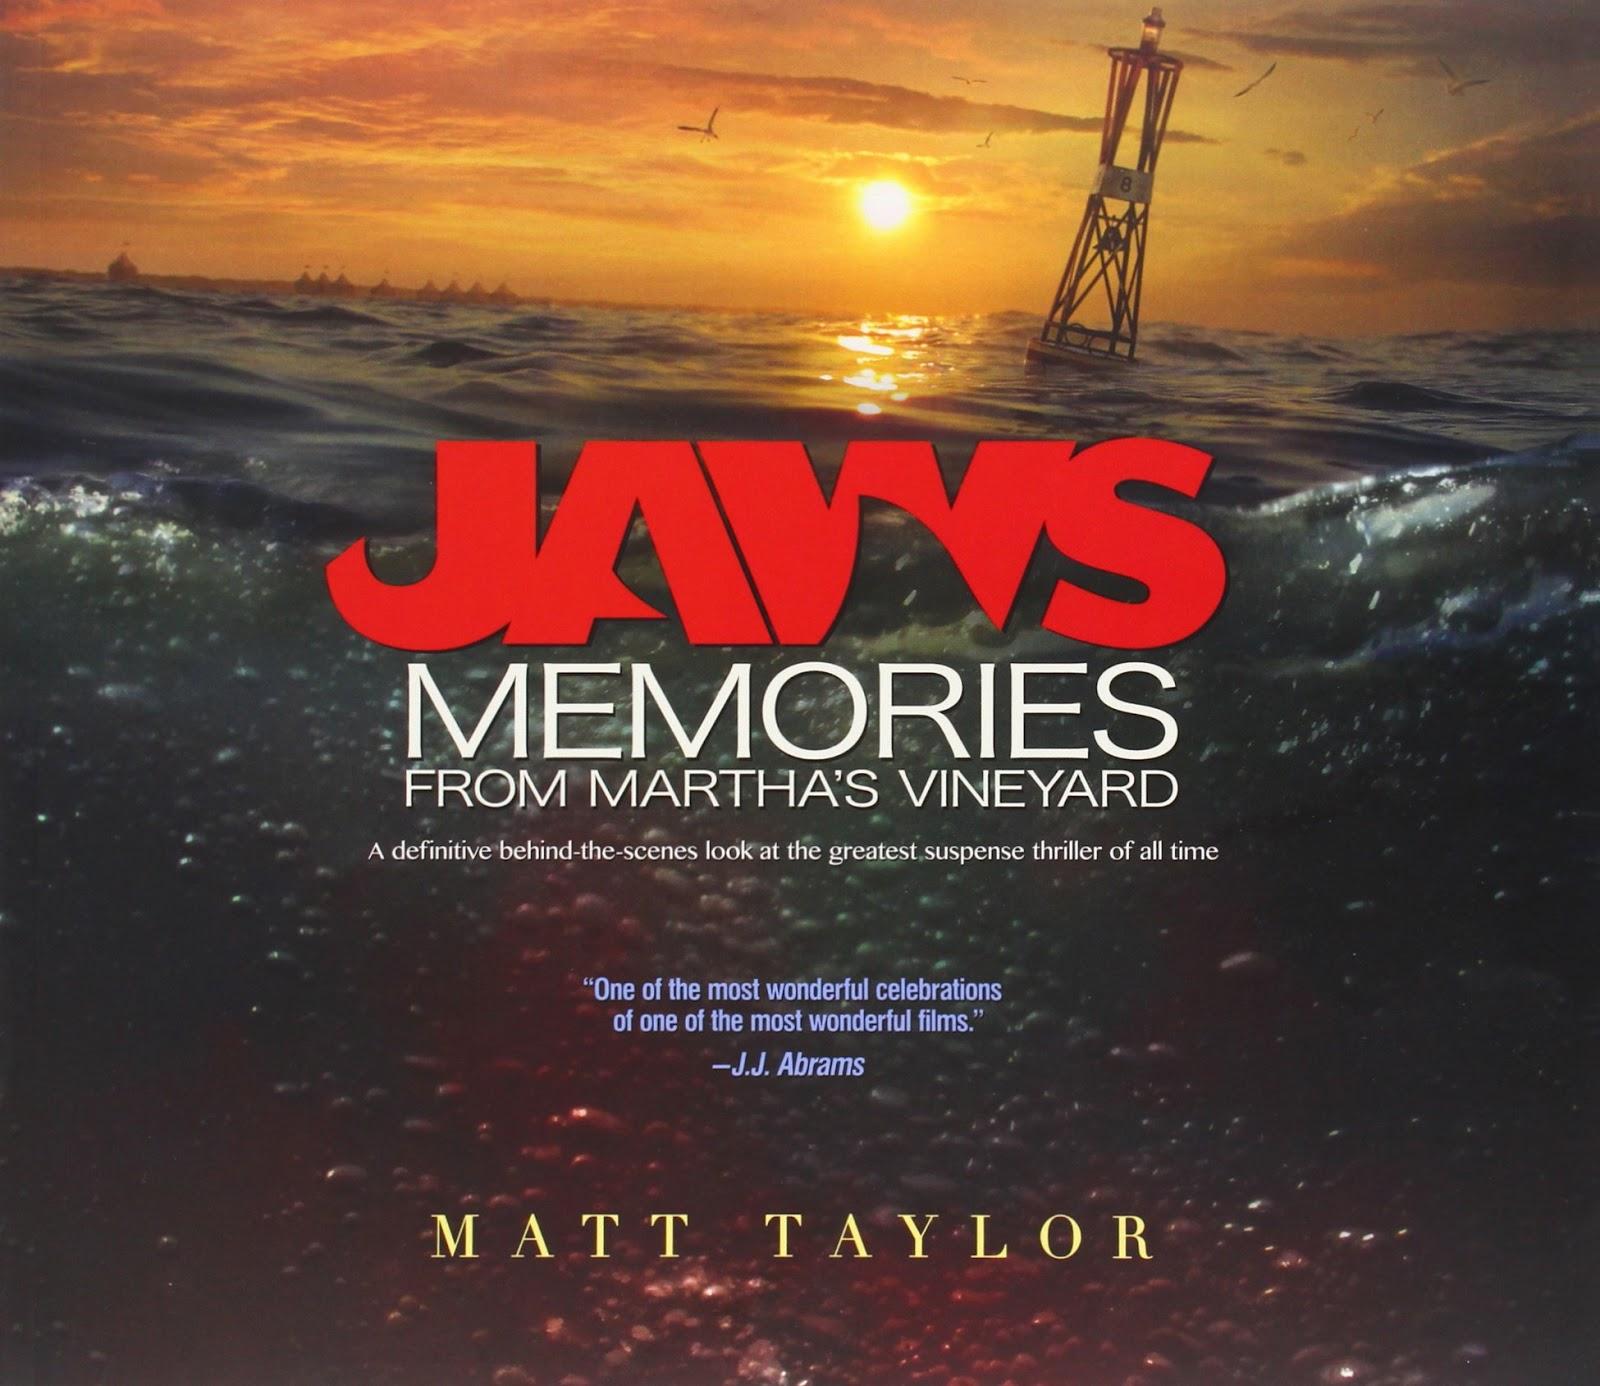 Jaws: Memories from Martha's Vineyard by Matt Taylor